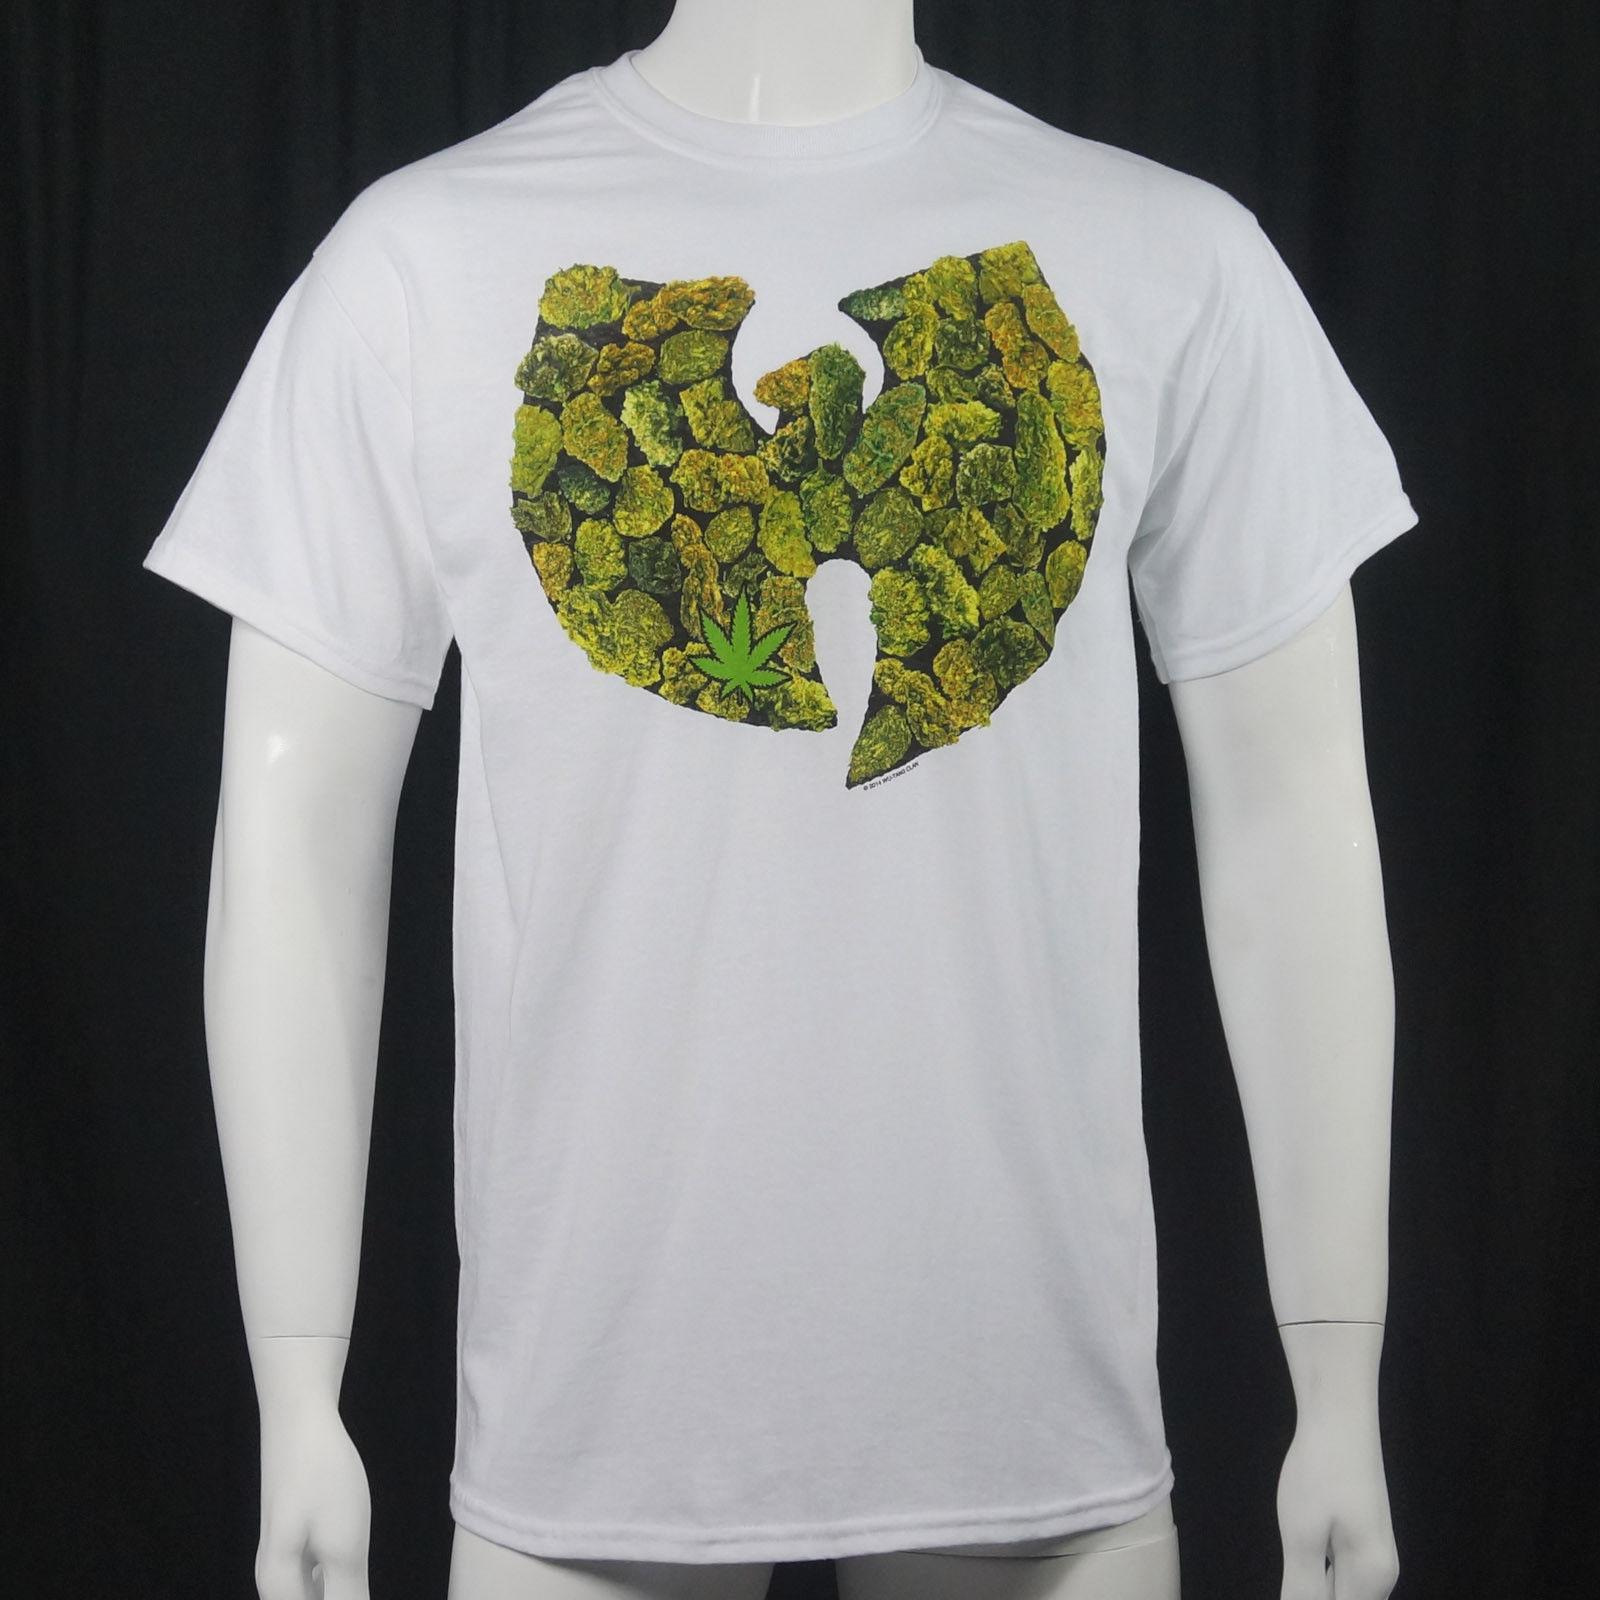 48067604443e Details Zu Authentic WU TANG CLAN Pot Leaf Logo T Shirt S M L XL 2XL NEW T  Shirt And Shirt Shop T Shirts Online From Lukehappy14, $12.96  DHgate.Com